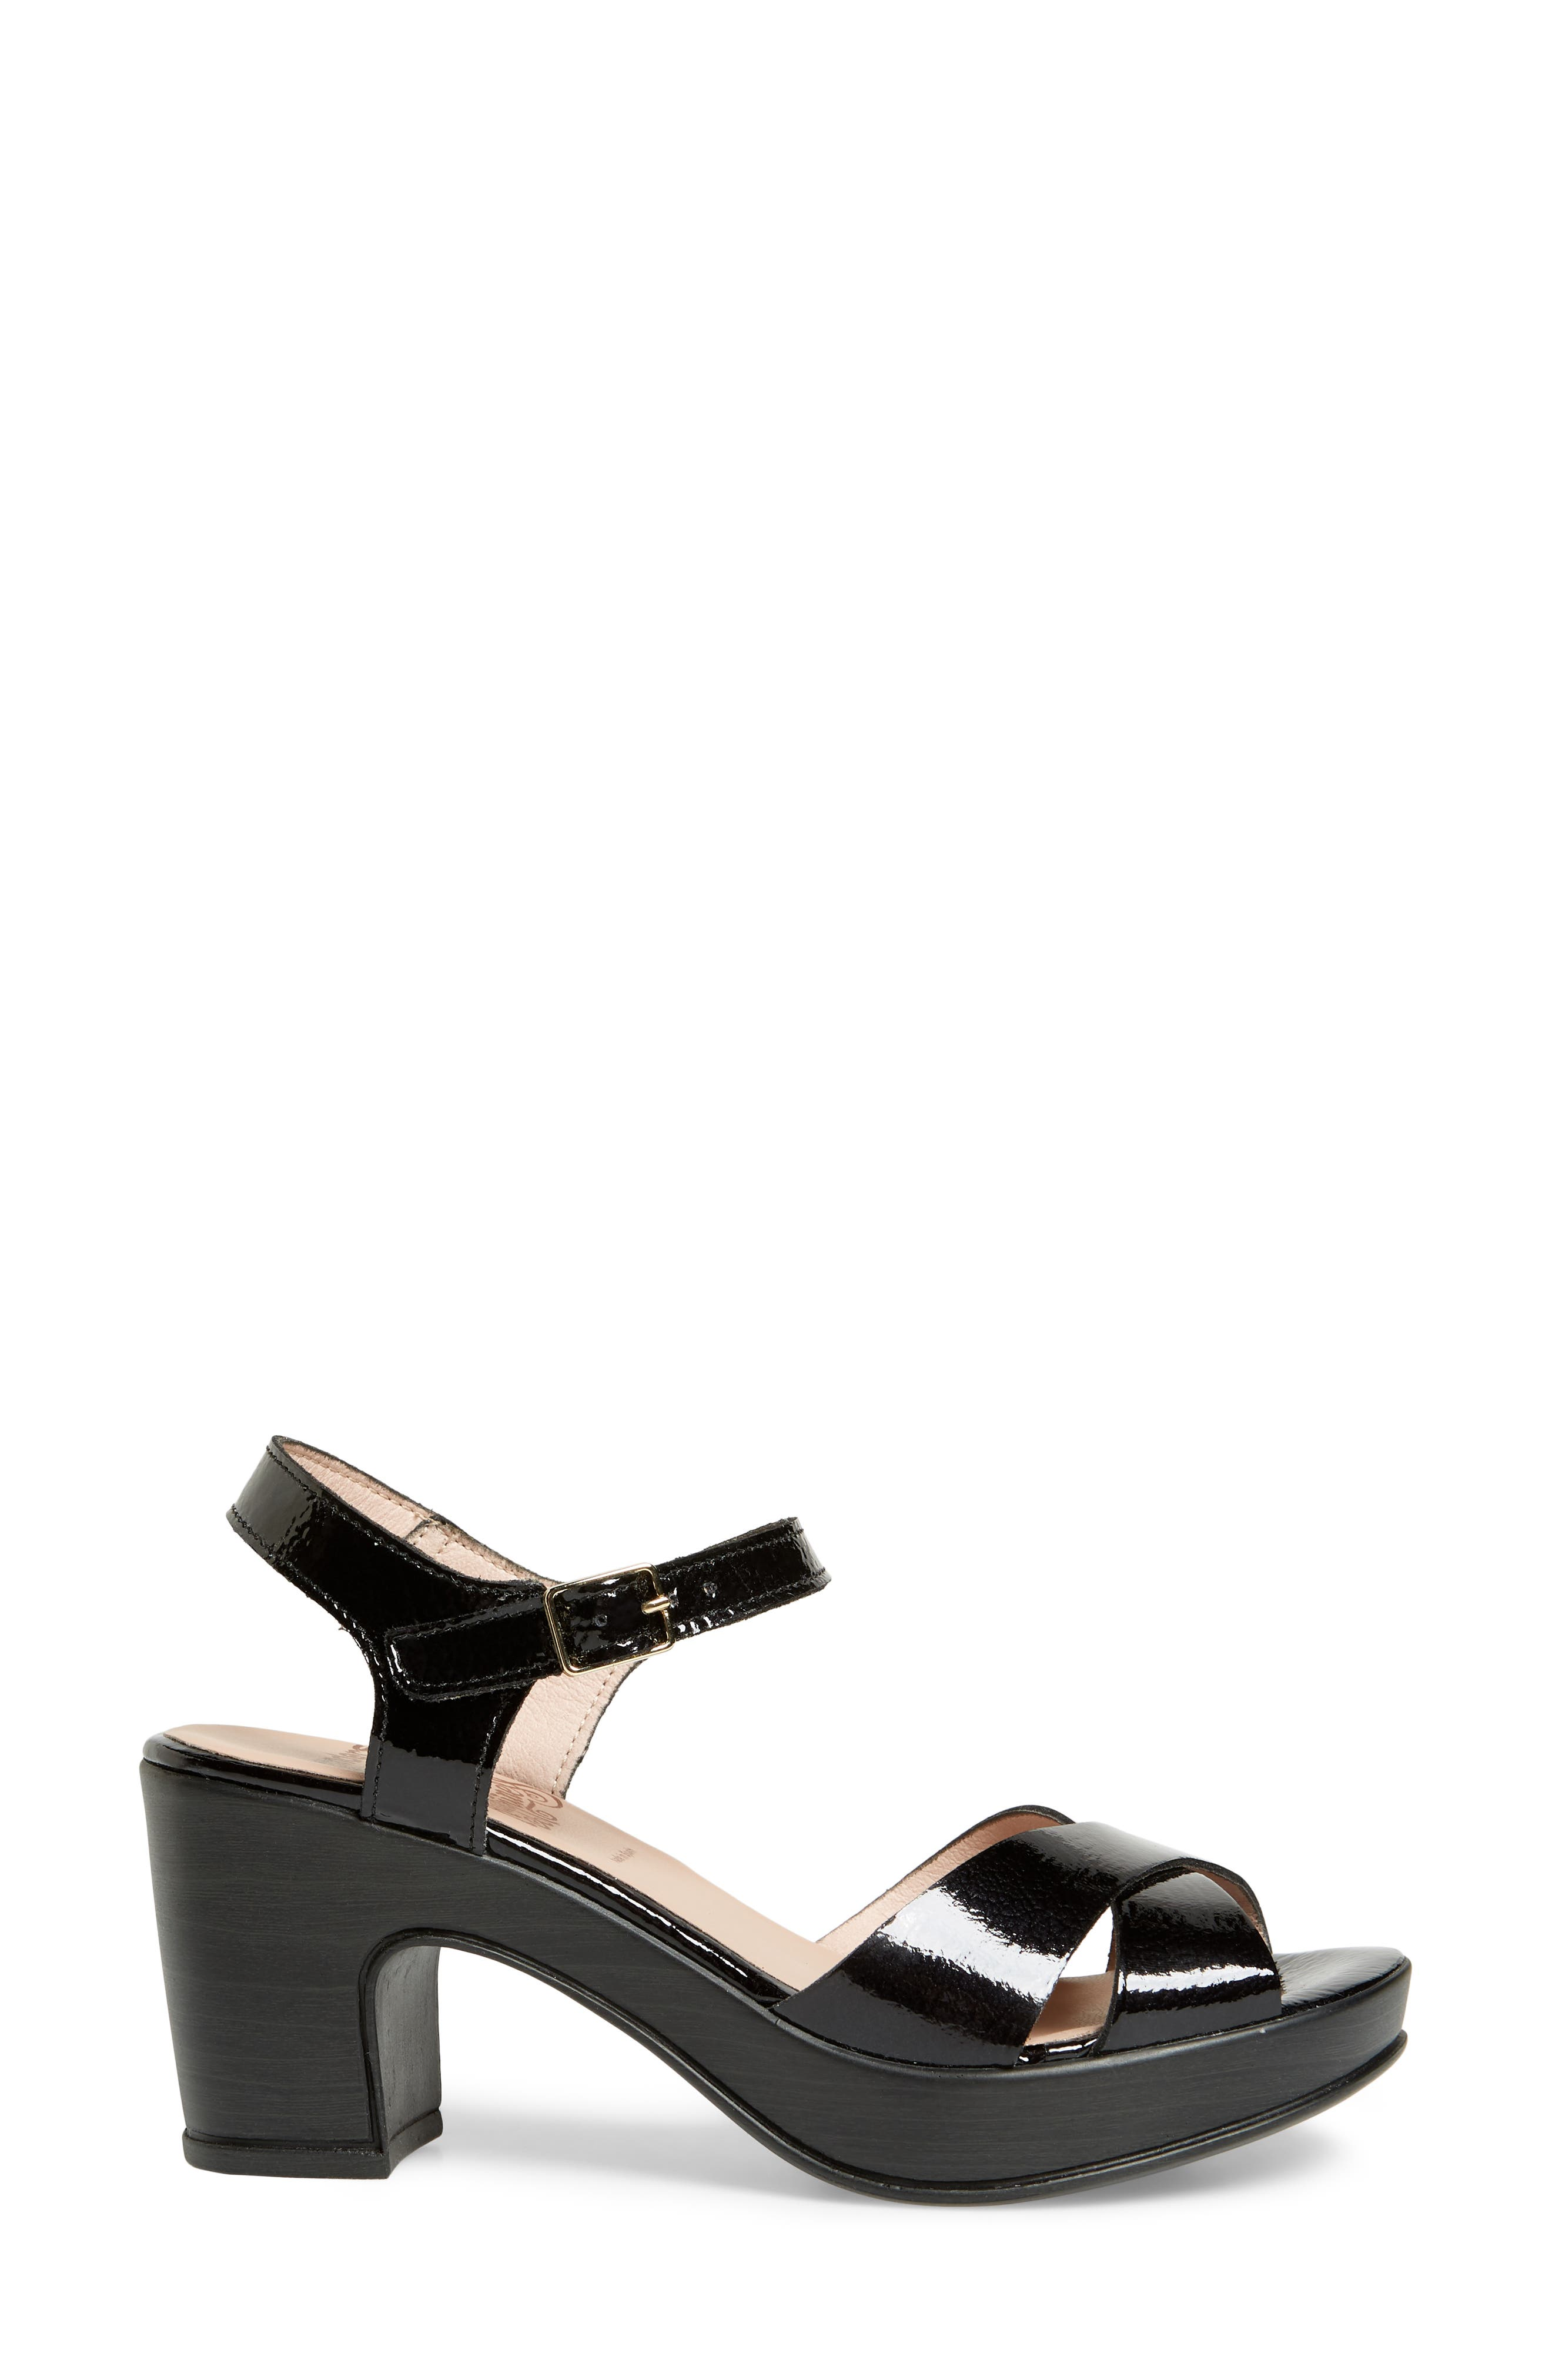 Platform Sandal,                             Alternate thumbnail 3, color,                             BLACK PATENT LEATHER